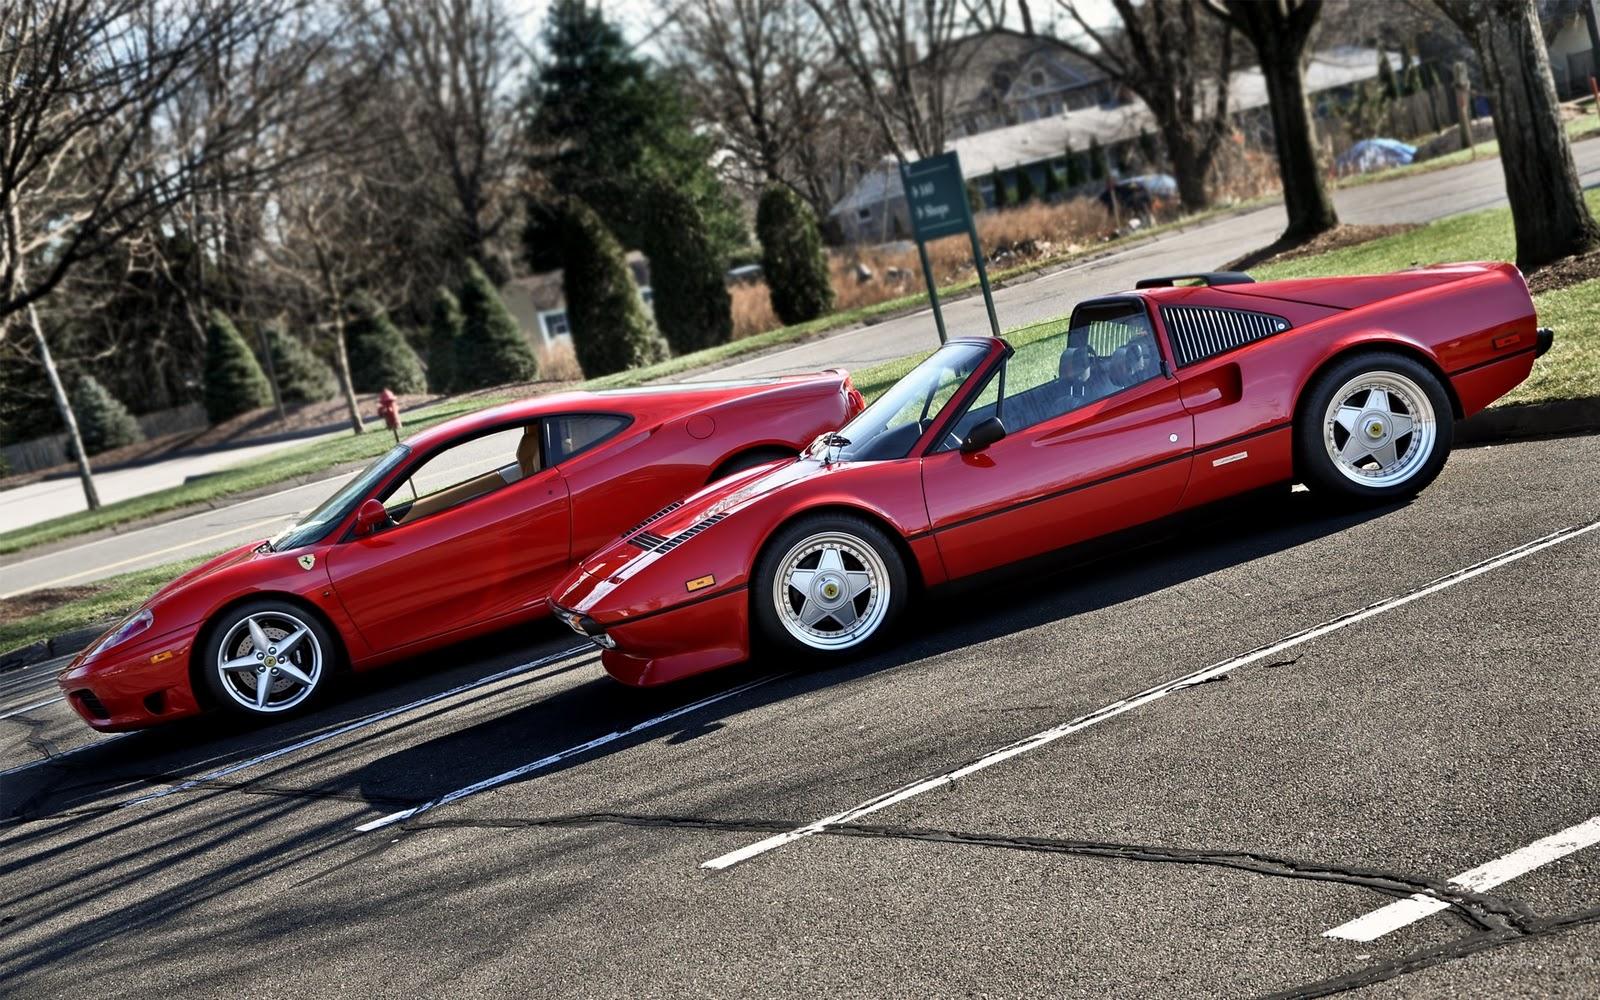 http://1.bp.blogspot.com/-zkPkd0TWoXk/Tvl3z21xdgI/AAAAAAAACw0/s18ugG0-KLs/s1600/Ferrari+328+GTS+Quattro+Valvole+%2528thewallpaperdb.blogspot.com%2529+%25283%2529.jpg